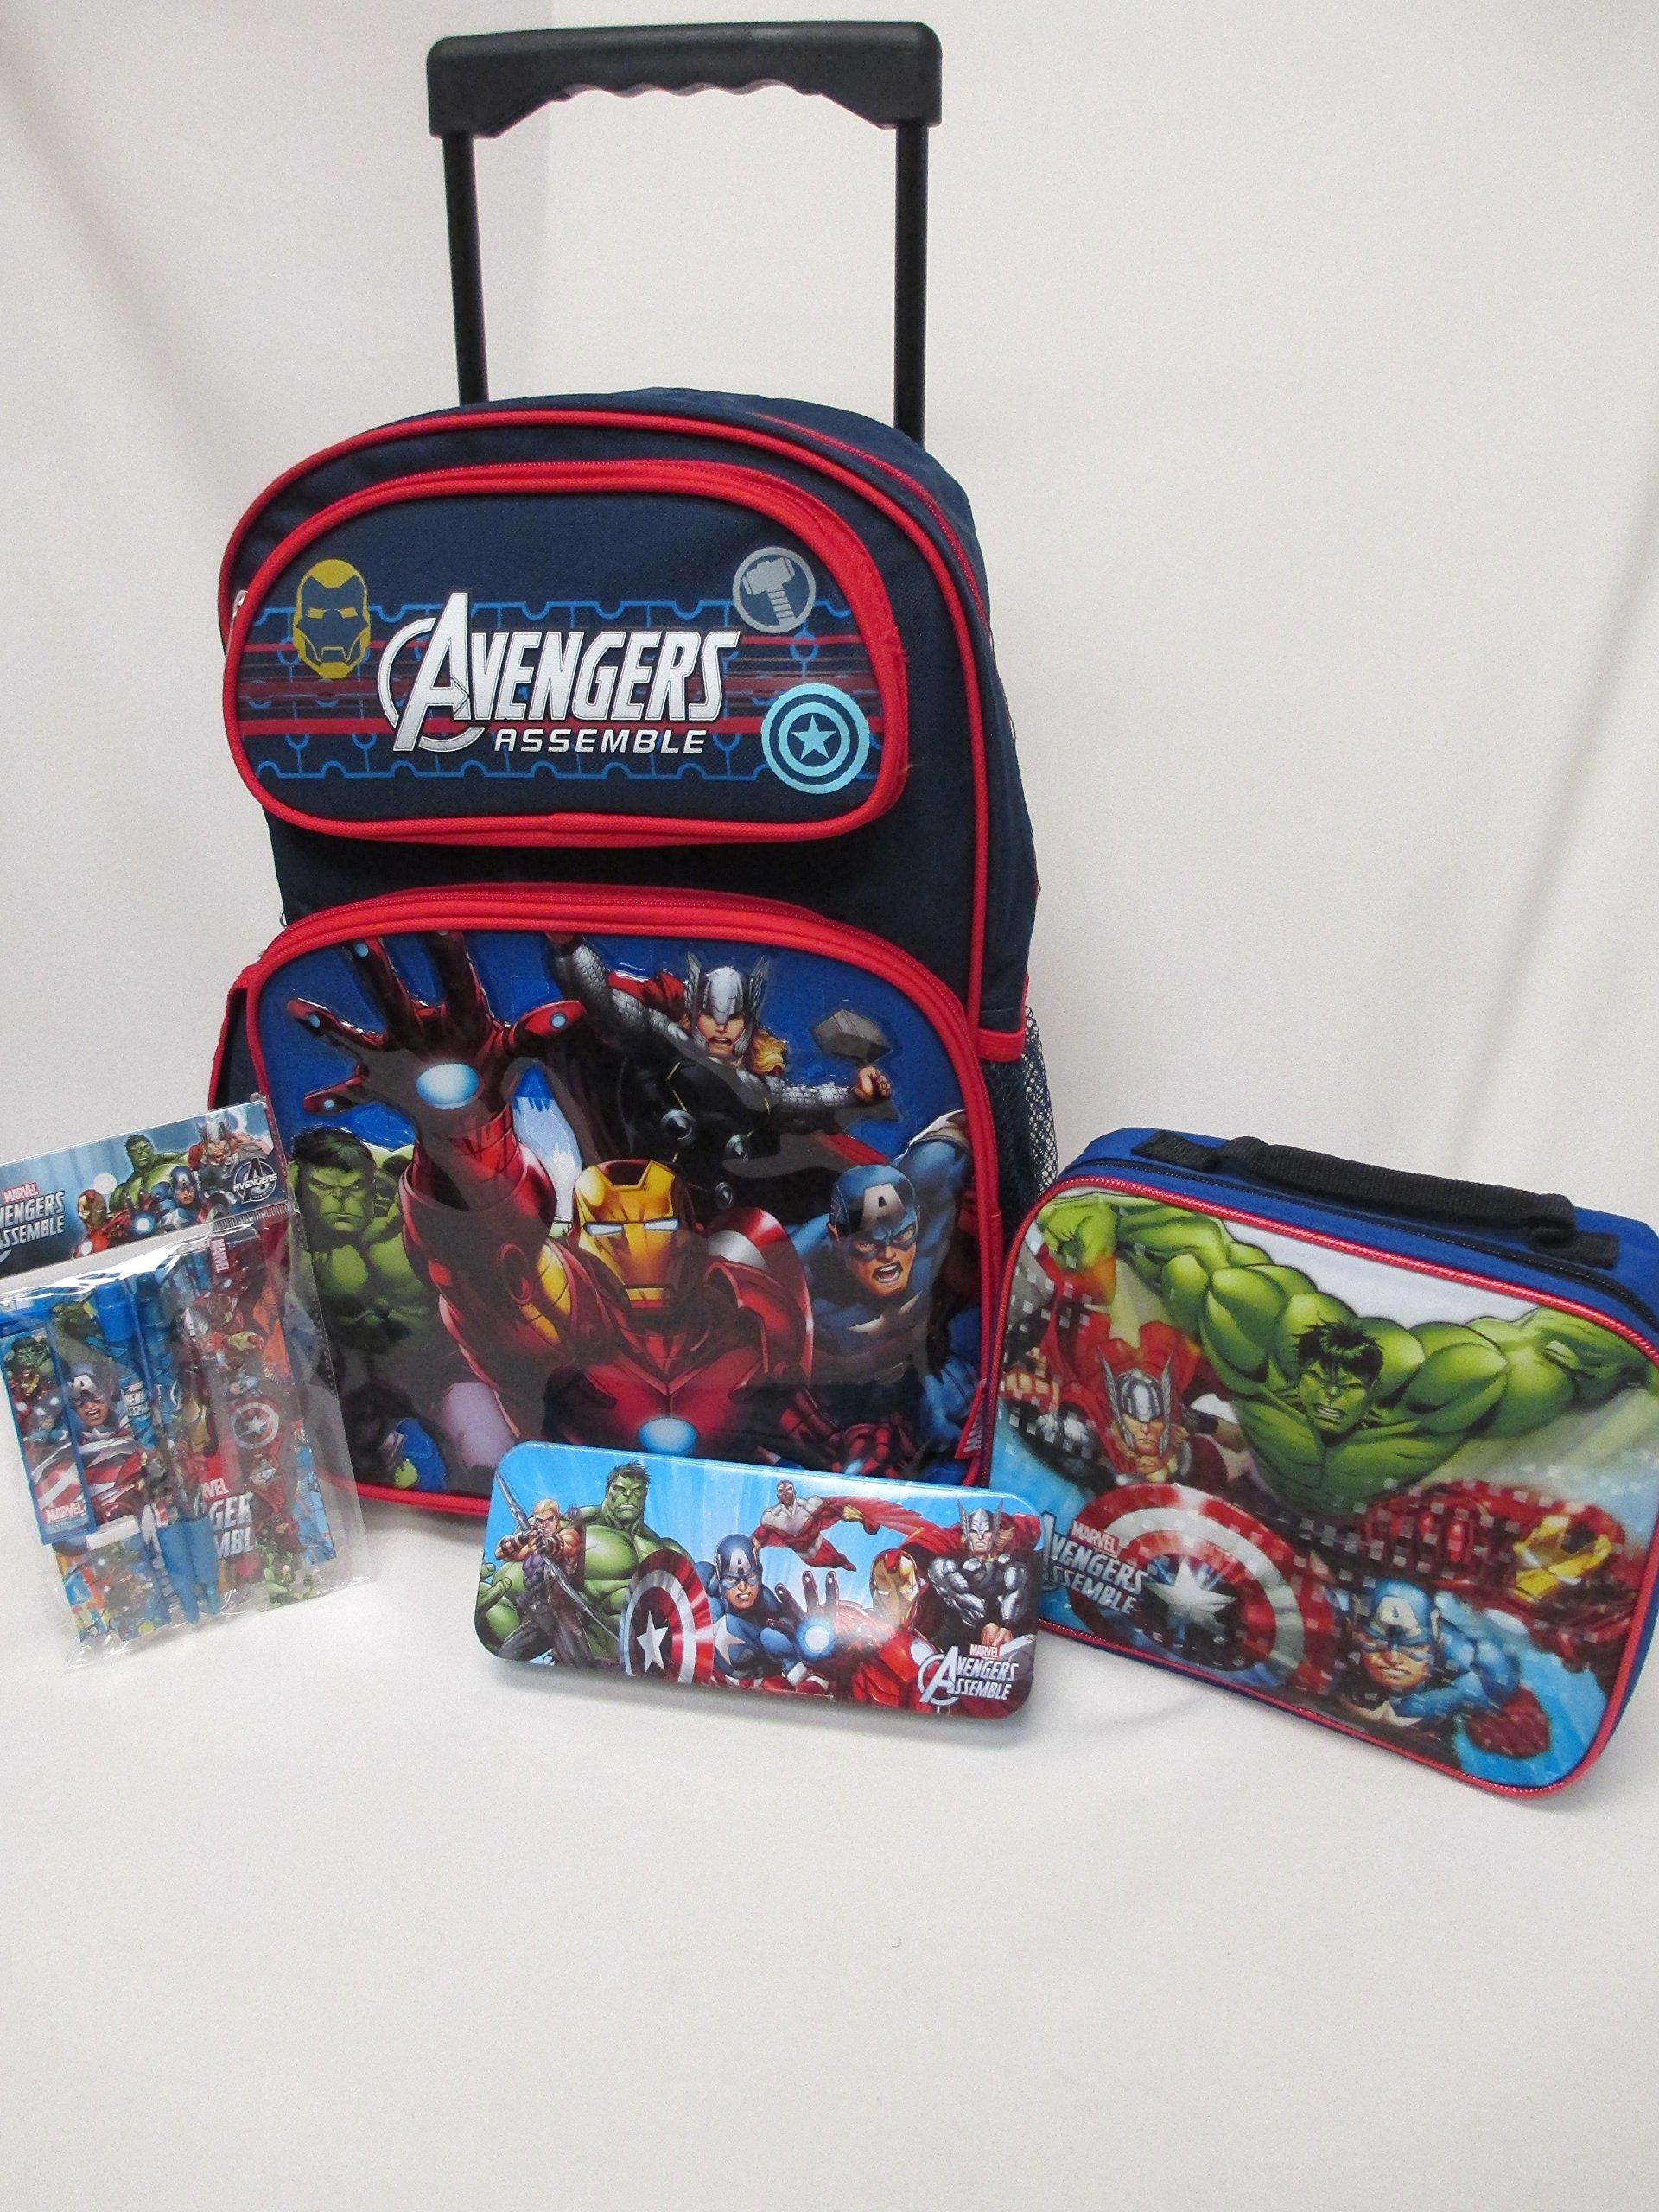 Avengers Assemble Marvel Large 16'' Rolling Backpack Roller Wheeled Book Bag, Lunch Box, Pencil Case & Stationery Set